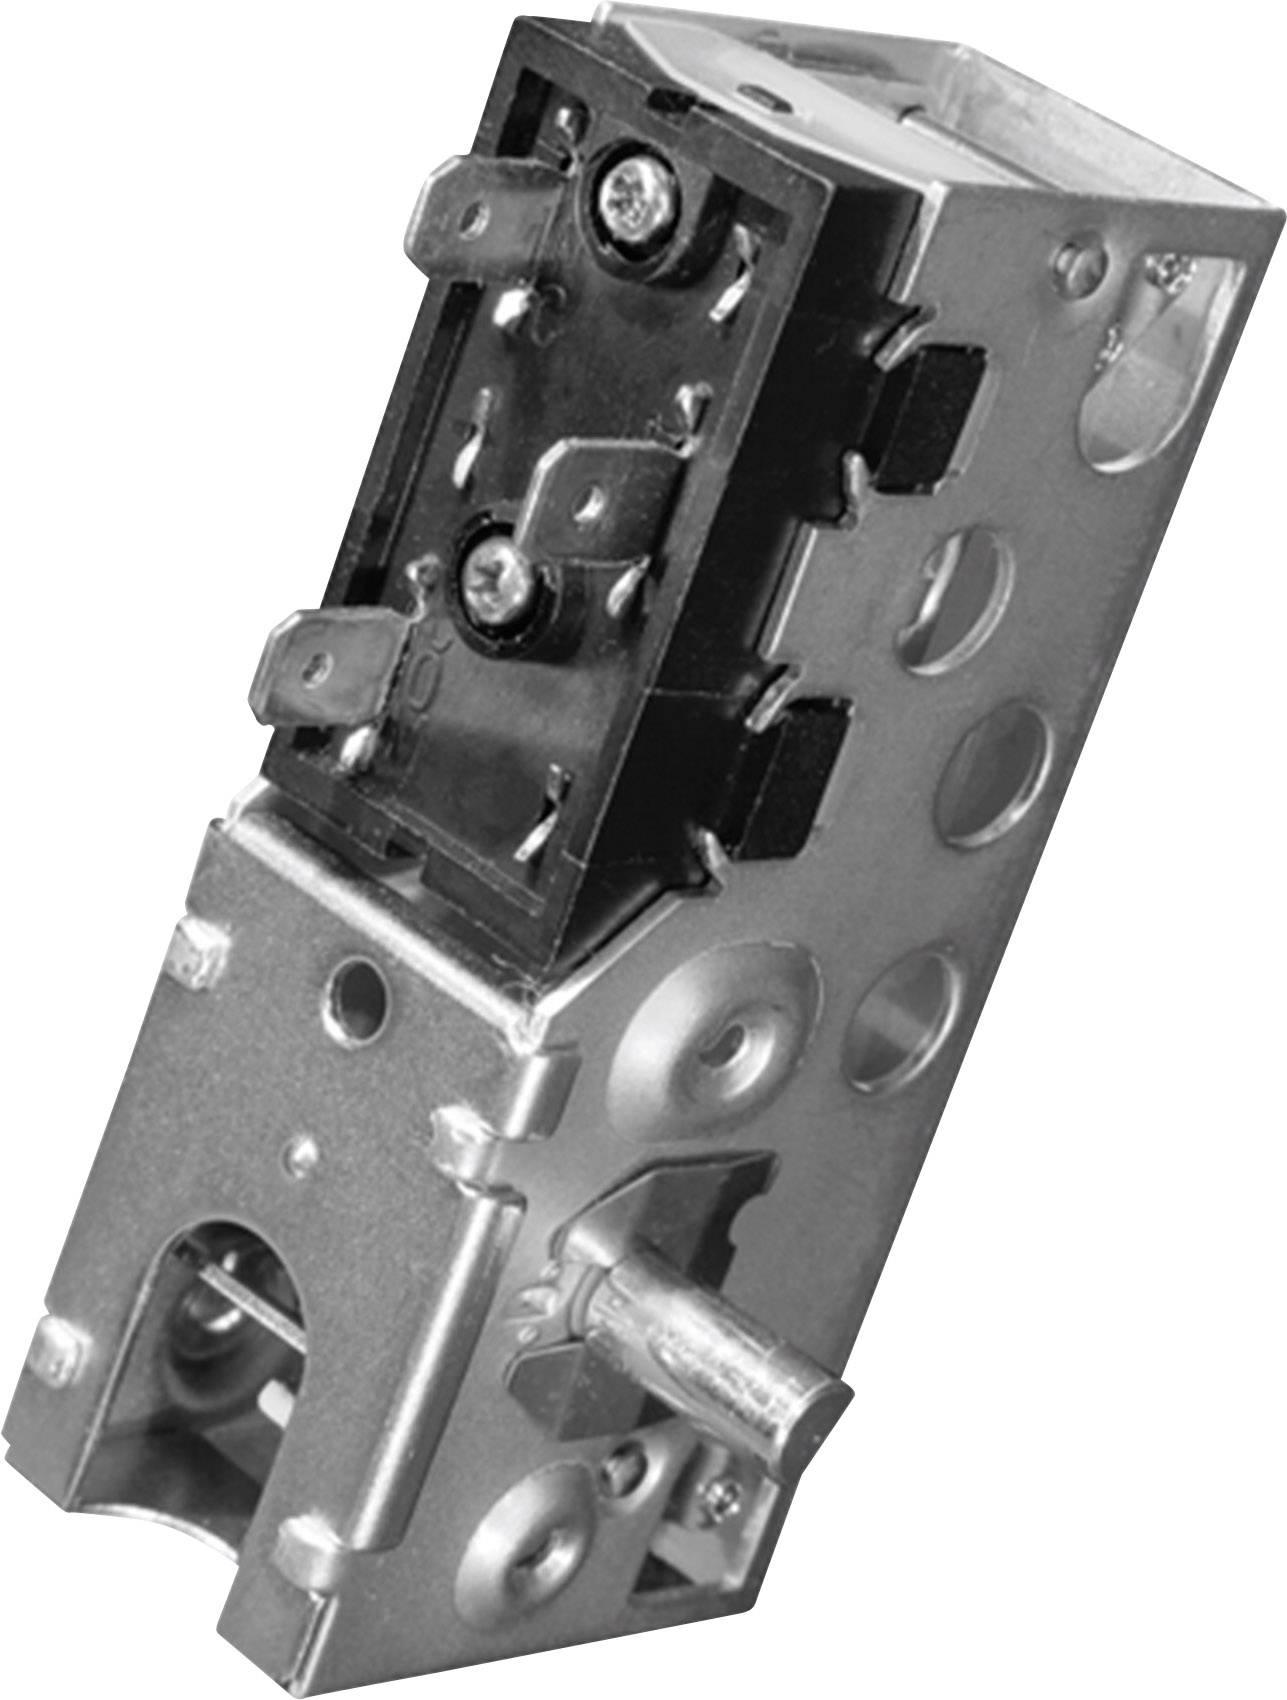 Regulátor vlhkosti B & B Thermo-Technik TW2001-C, 10 - 80 % r., 10 - 40 °C